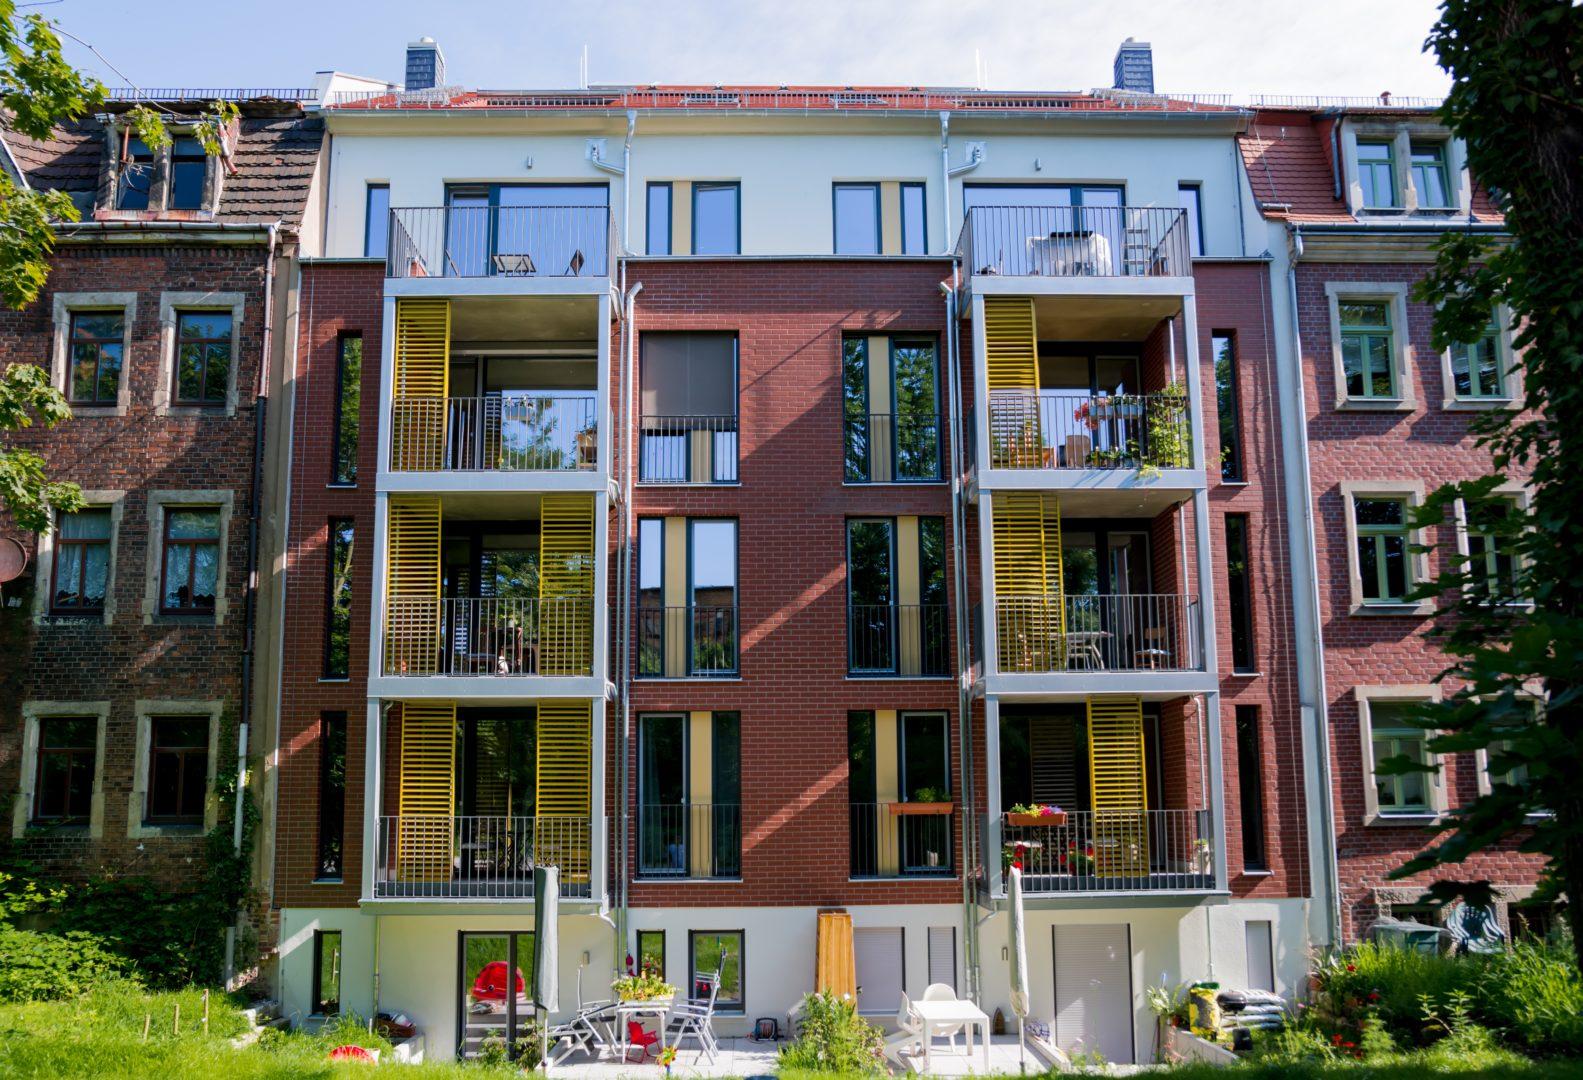 Lößnitz大街17a号改建